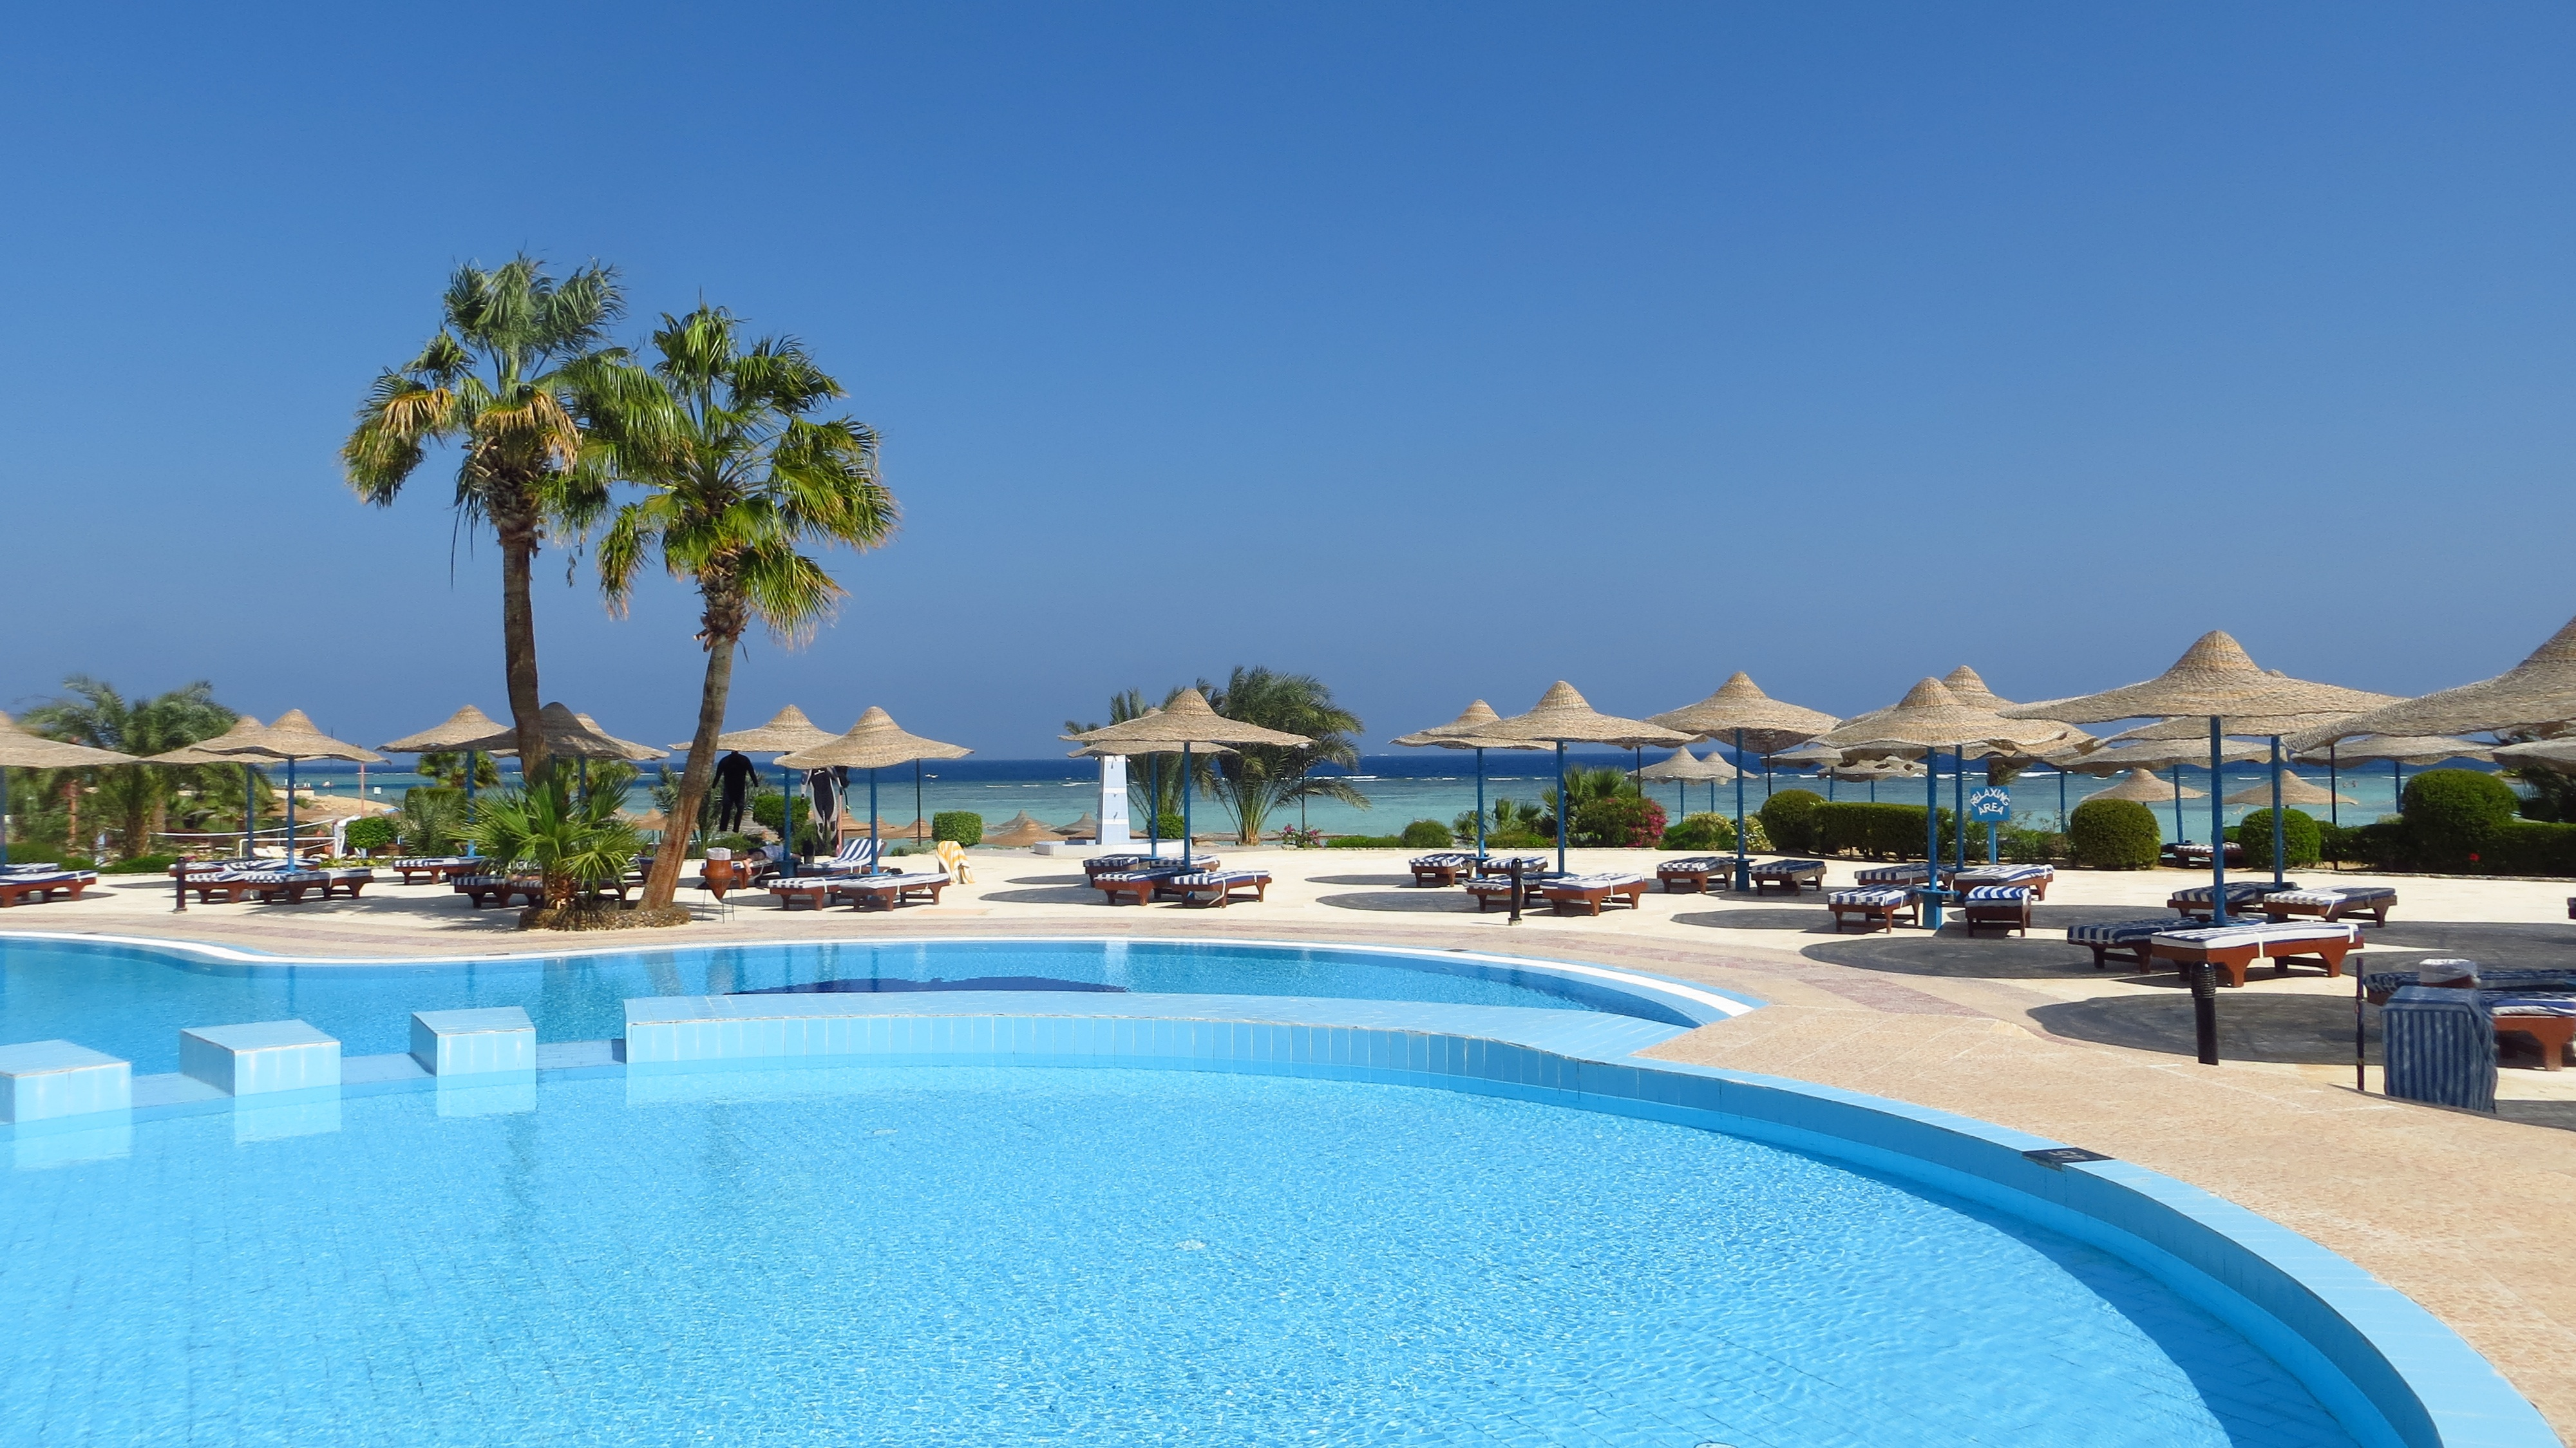 hotel-pool-image